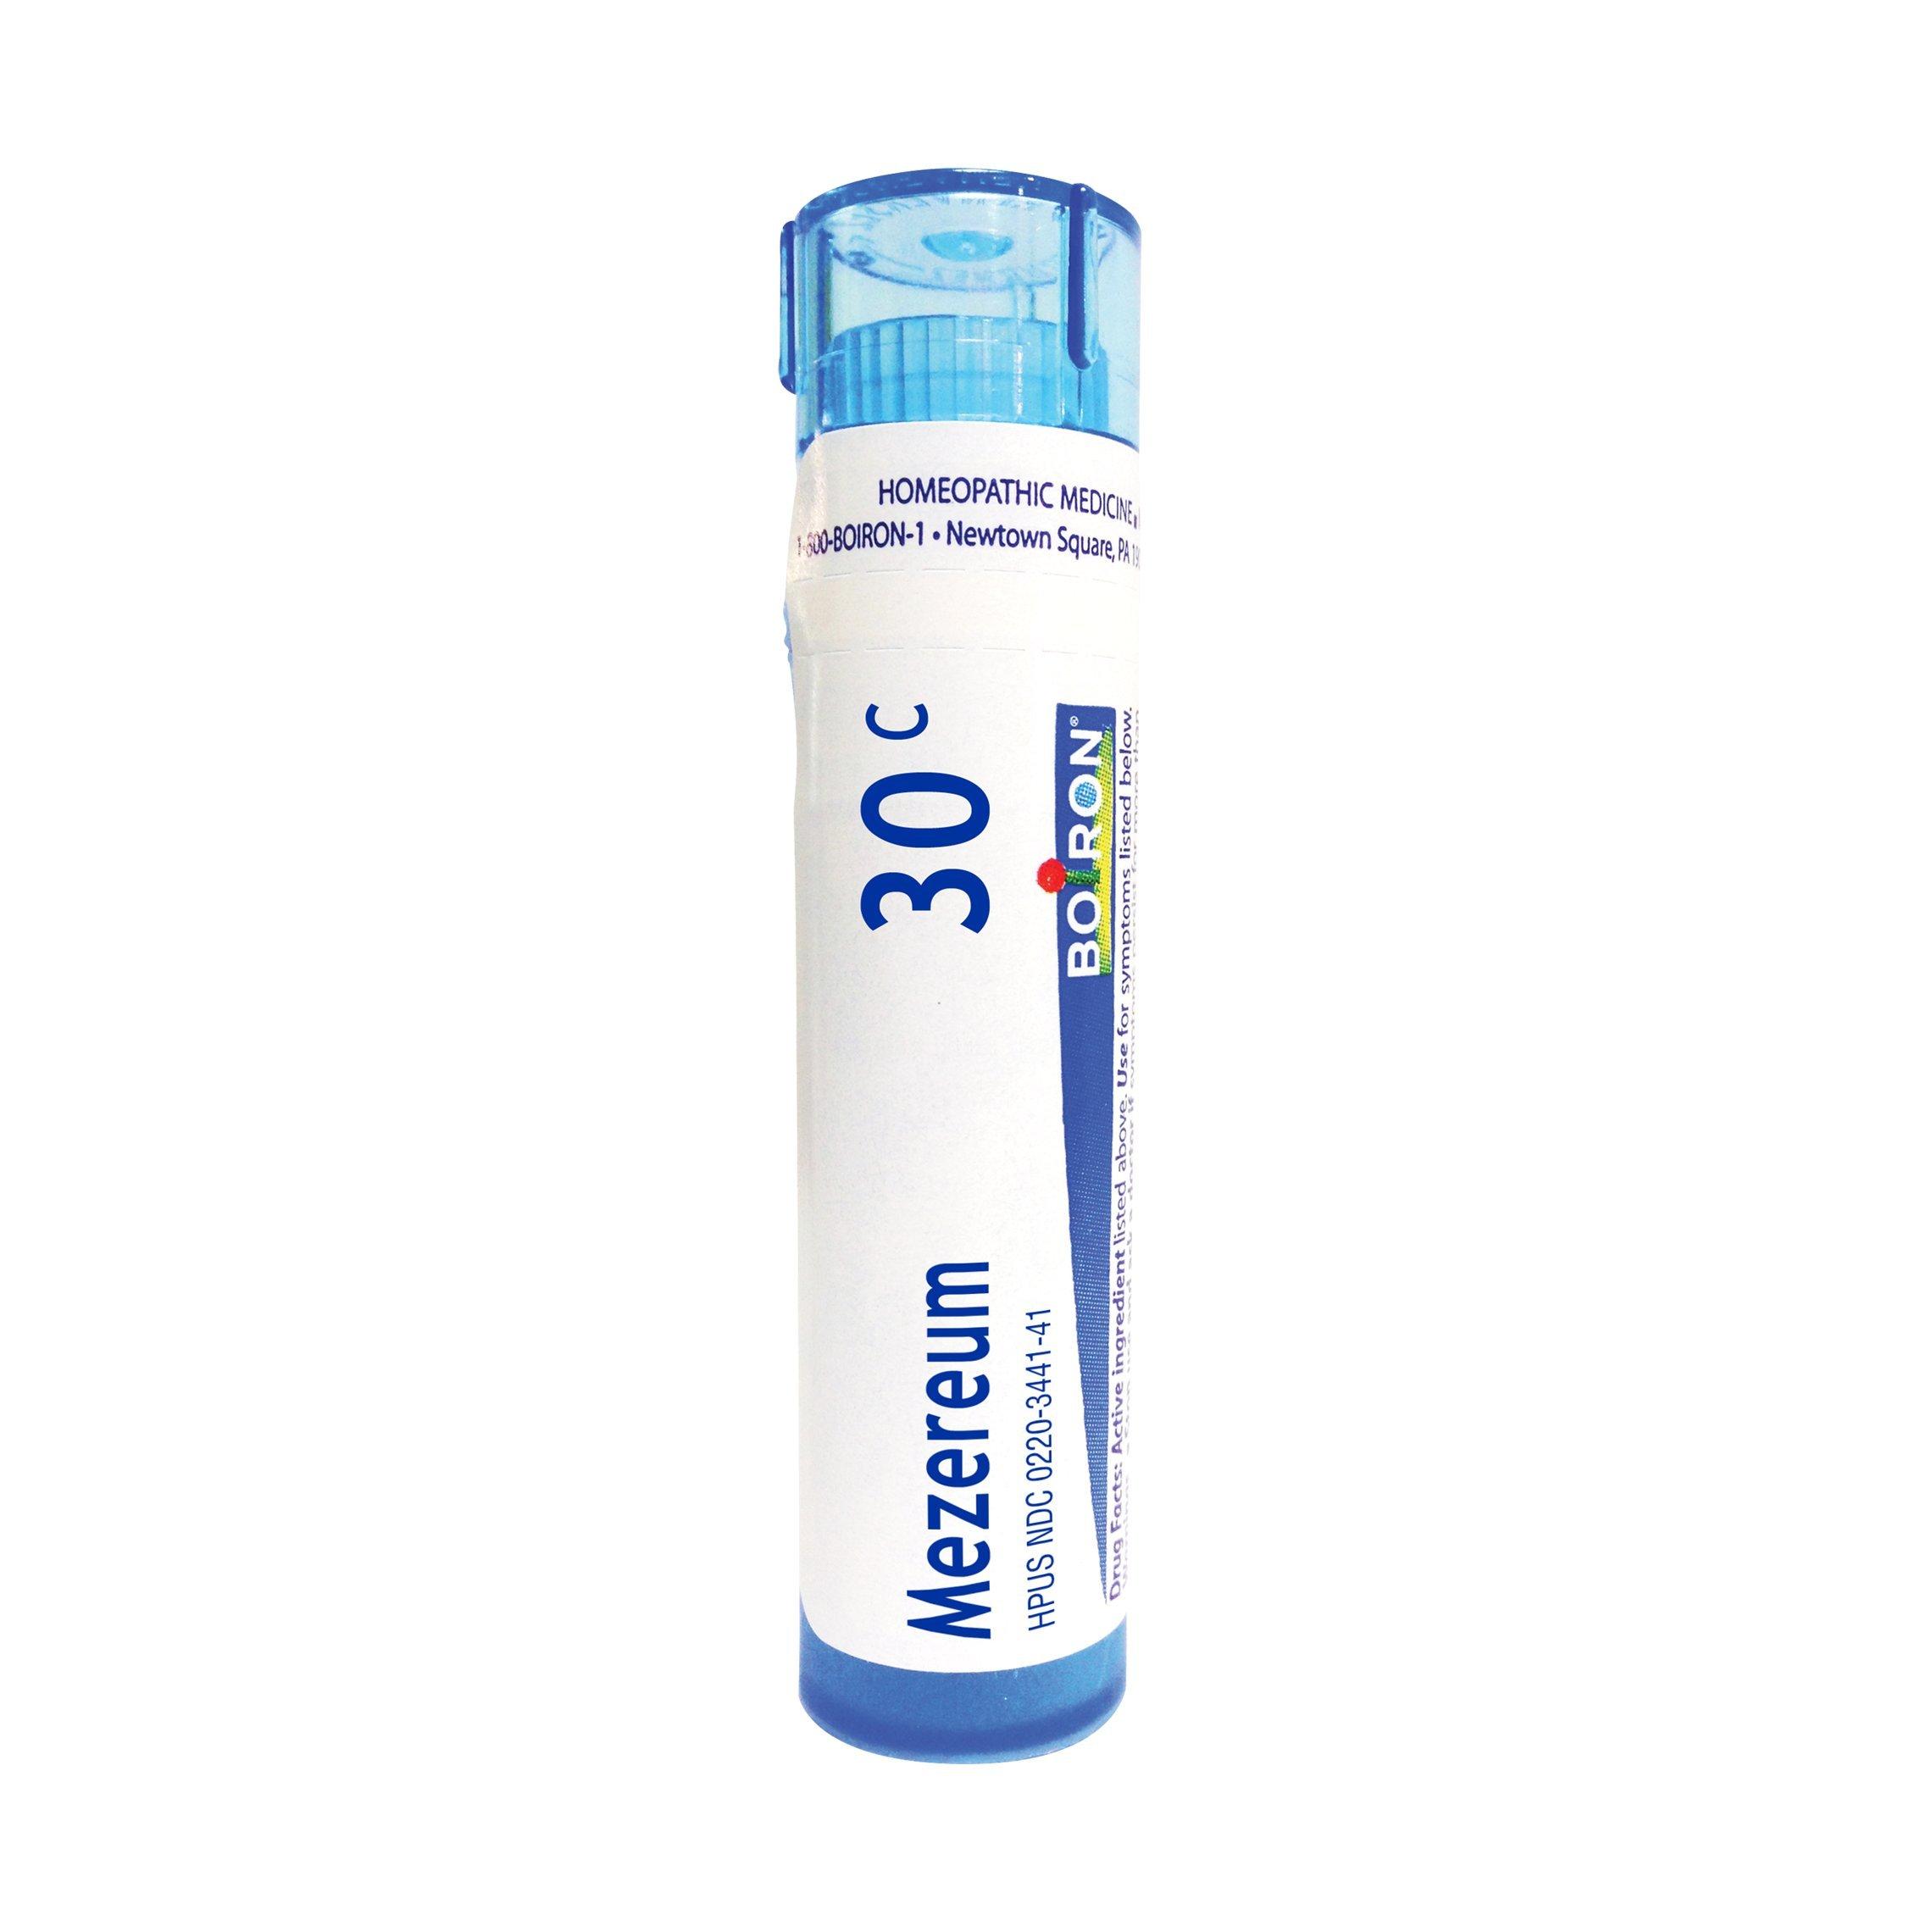 Boiron Mezereum 30C, 80 Pellets, Homeopathic Medicine for Nasal Congestion